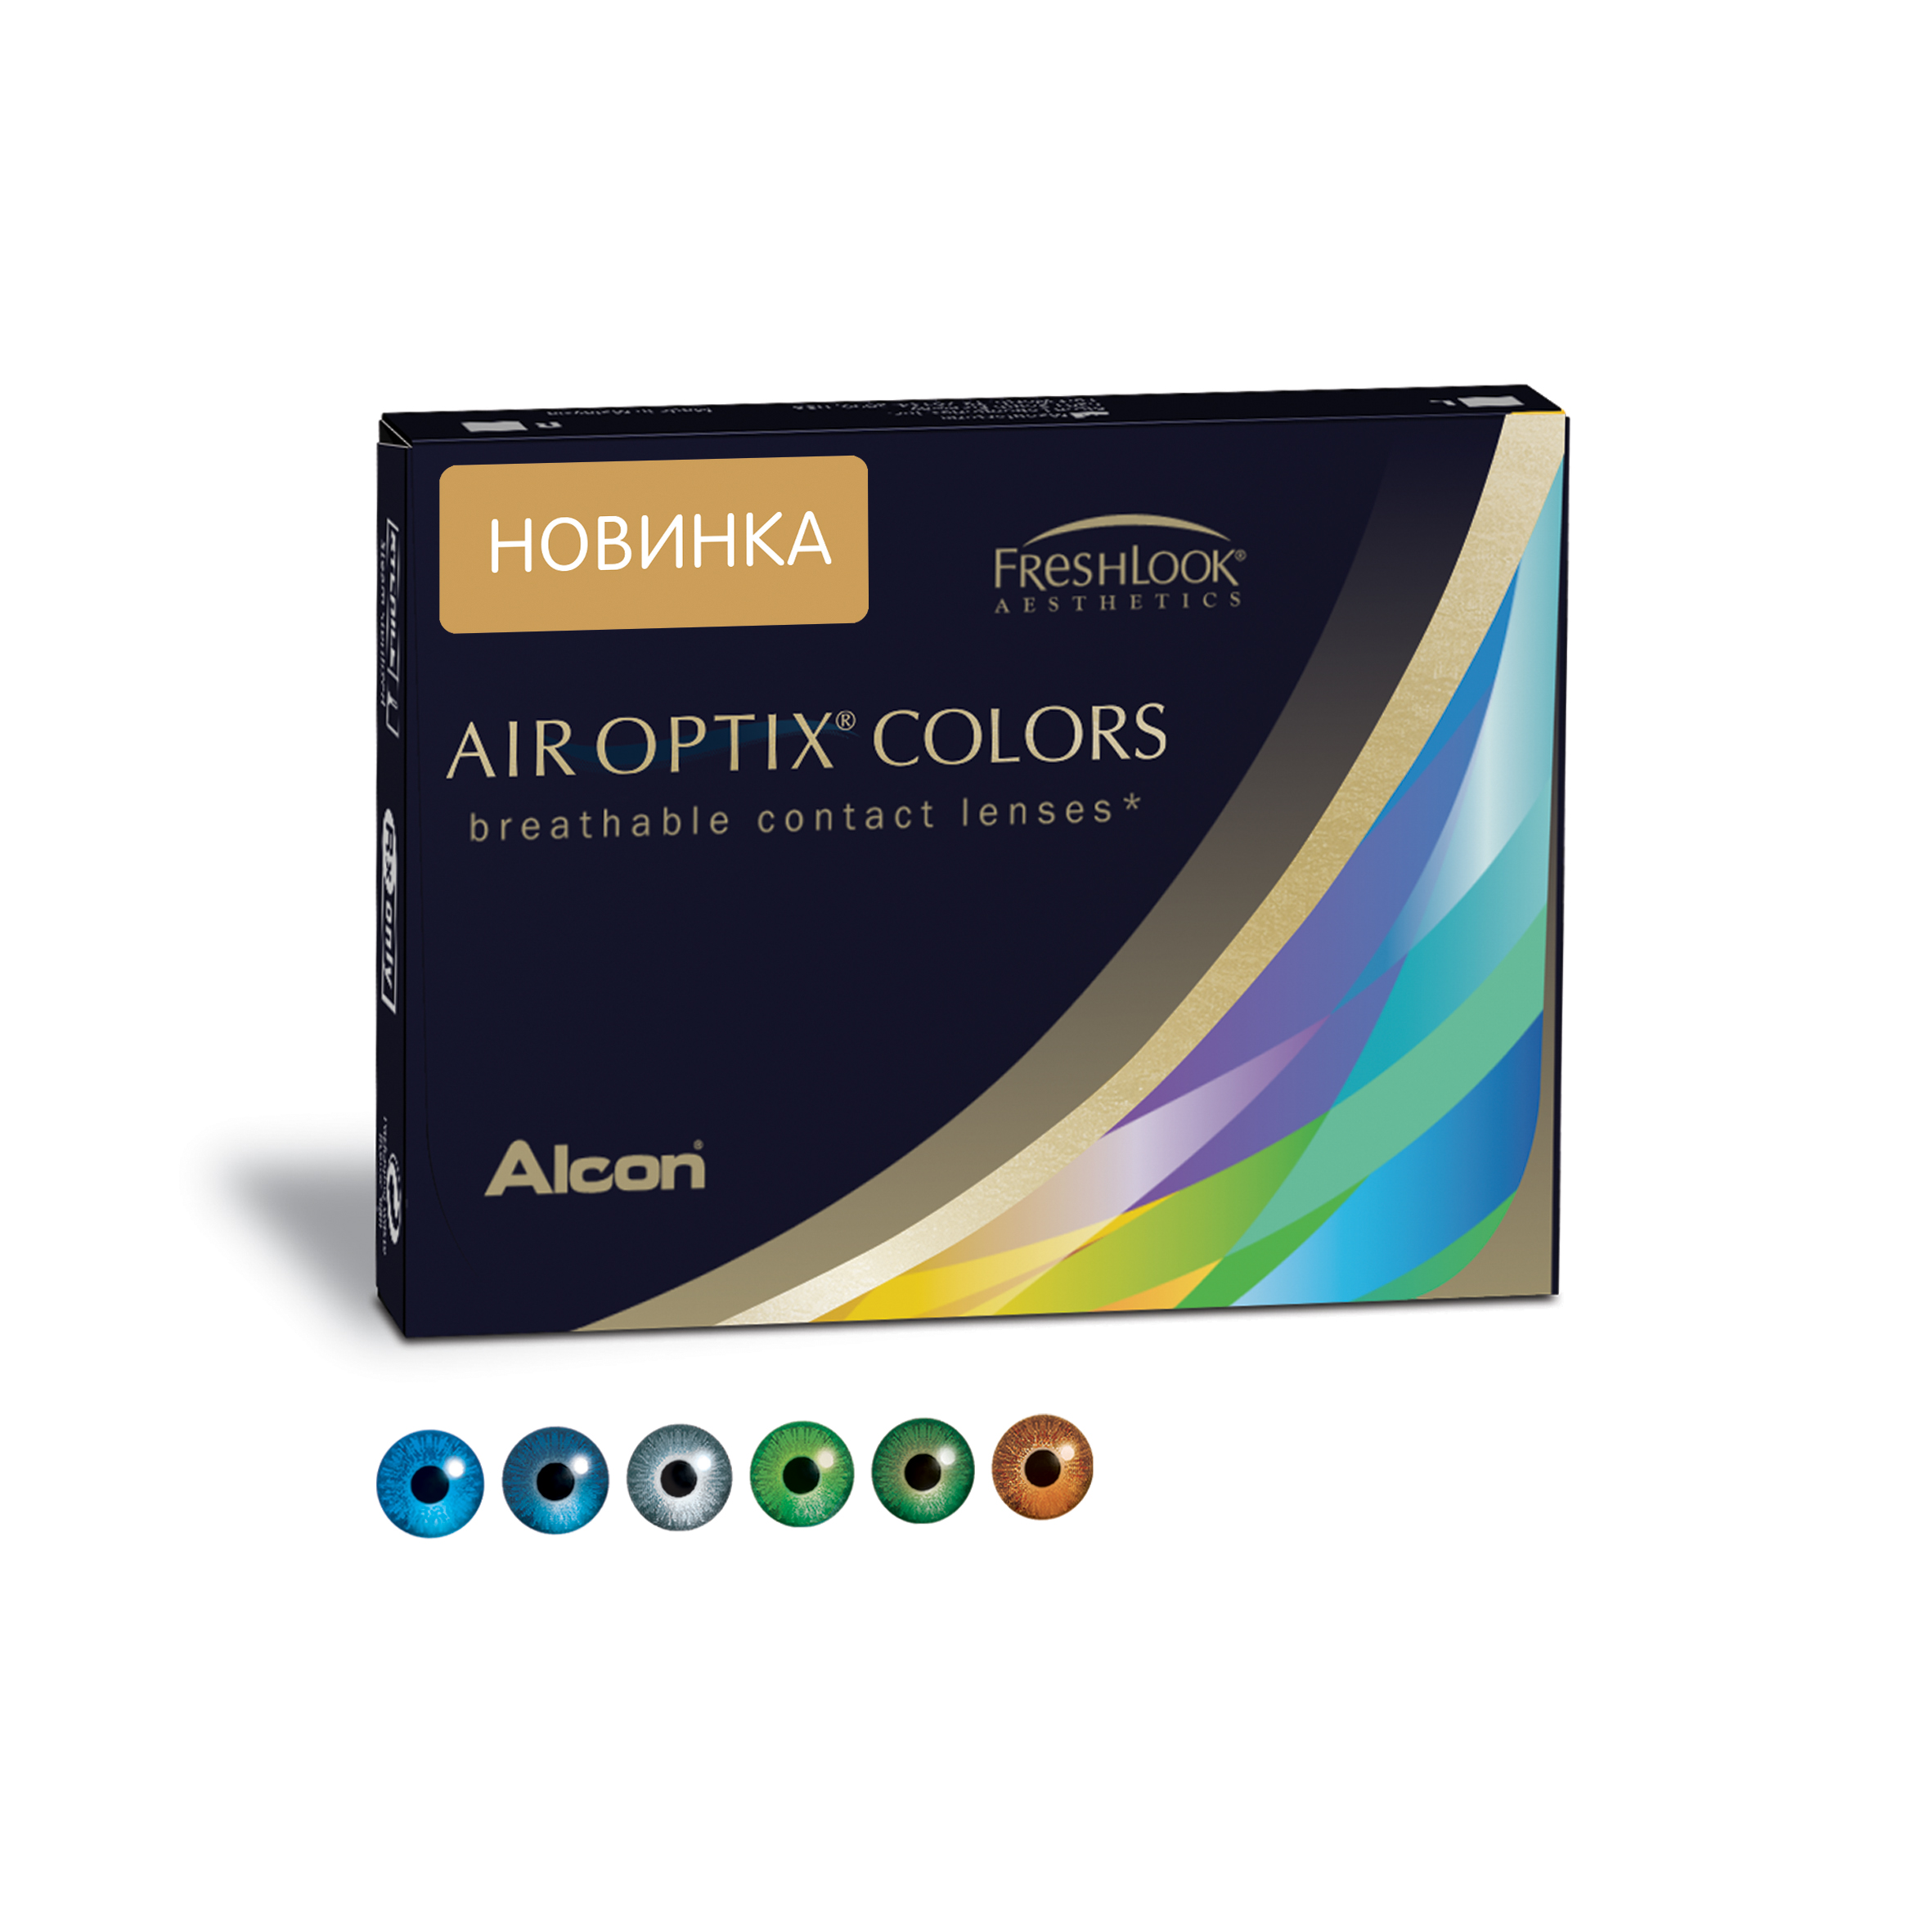 Аlcon контактные линзы Air Optix Colors 2 шт -7.00 Blue